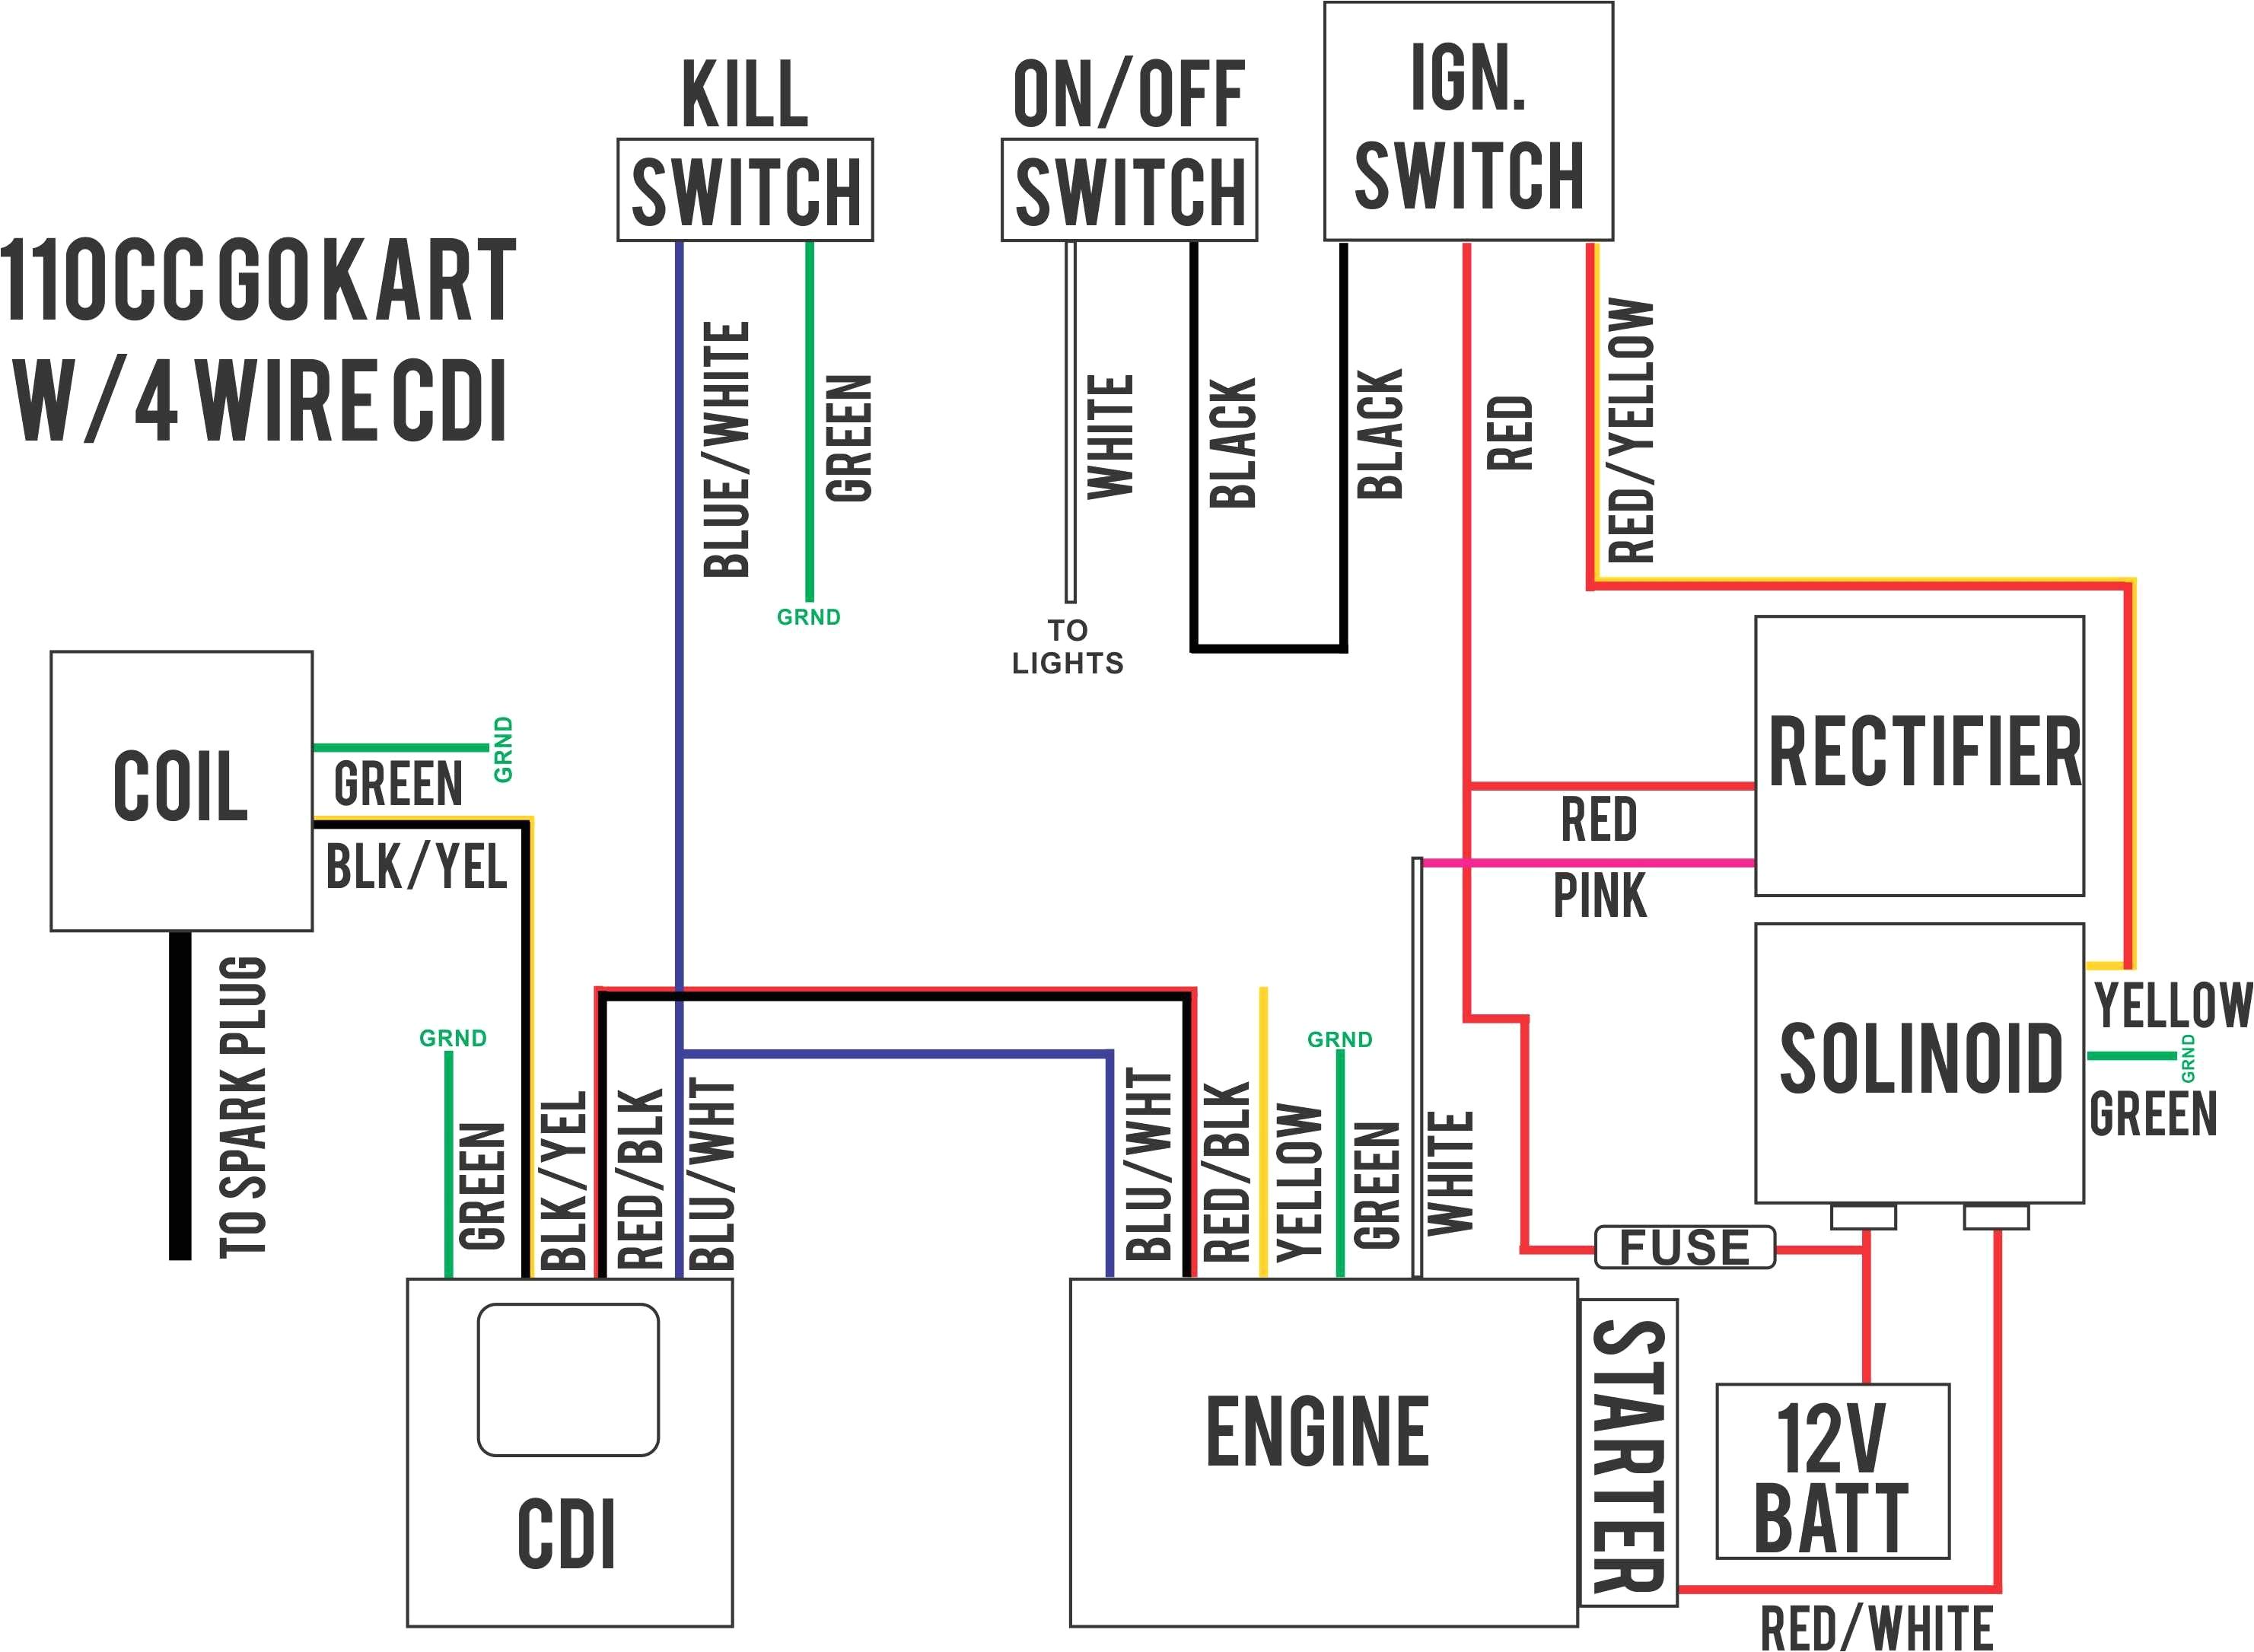 omron 61f g ap wiring diagram best of wiring relay omron free download wiring diagrams wiring